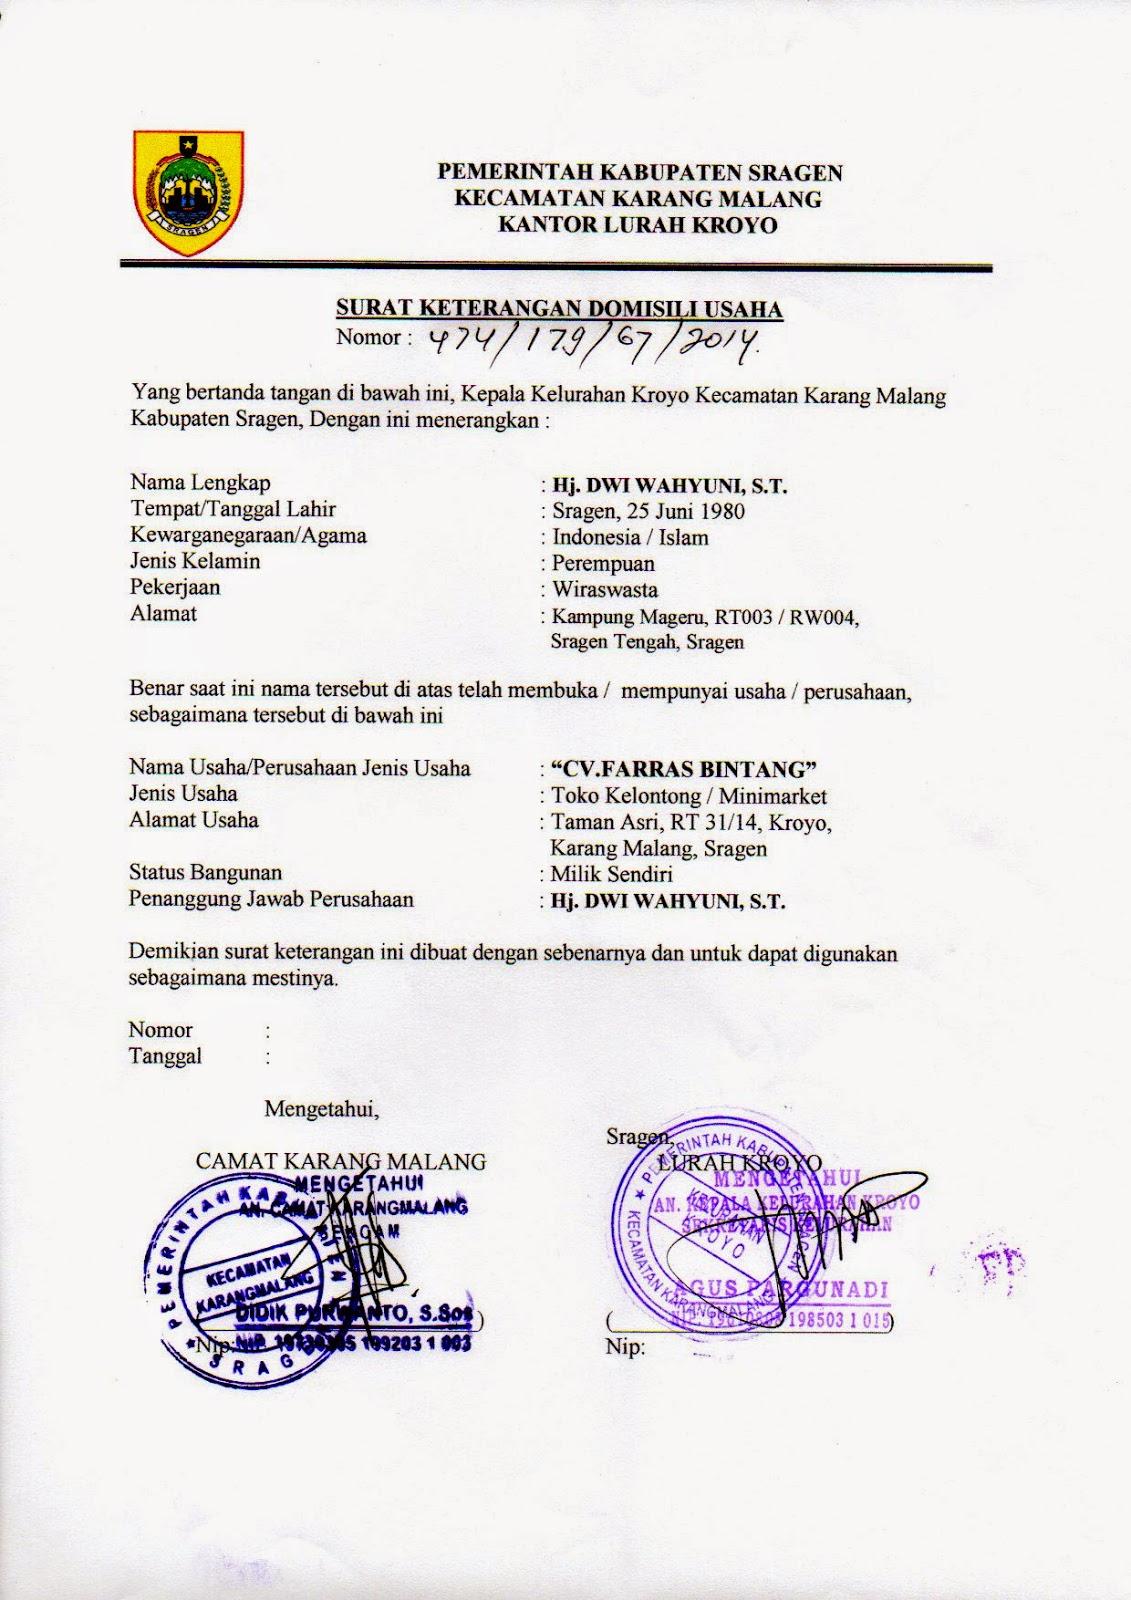 Contoh Surat Keterangan Domisili Kota Malang Contoh Surat